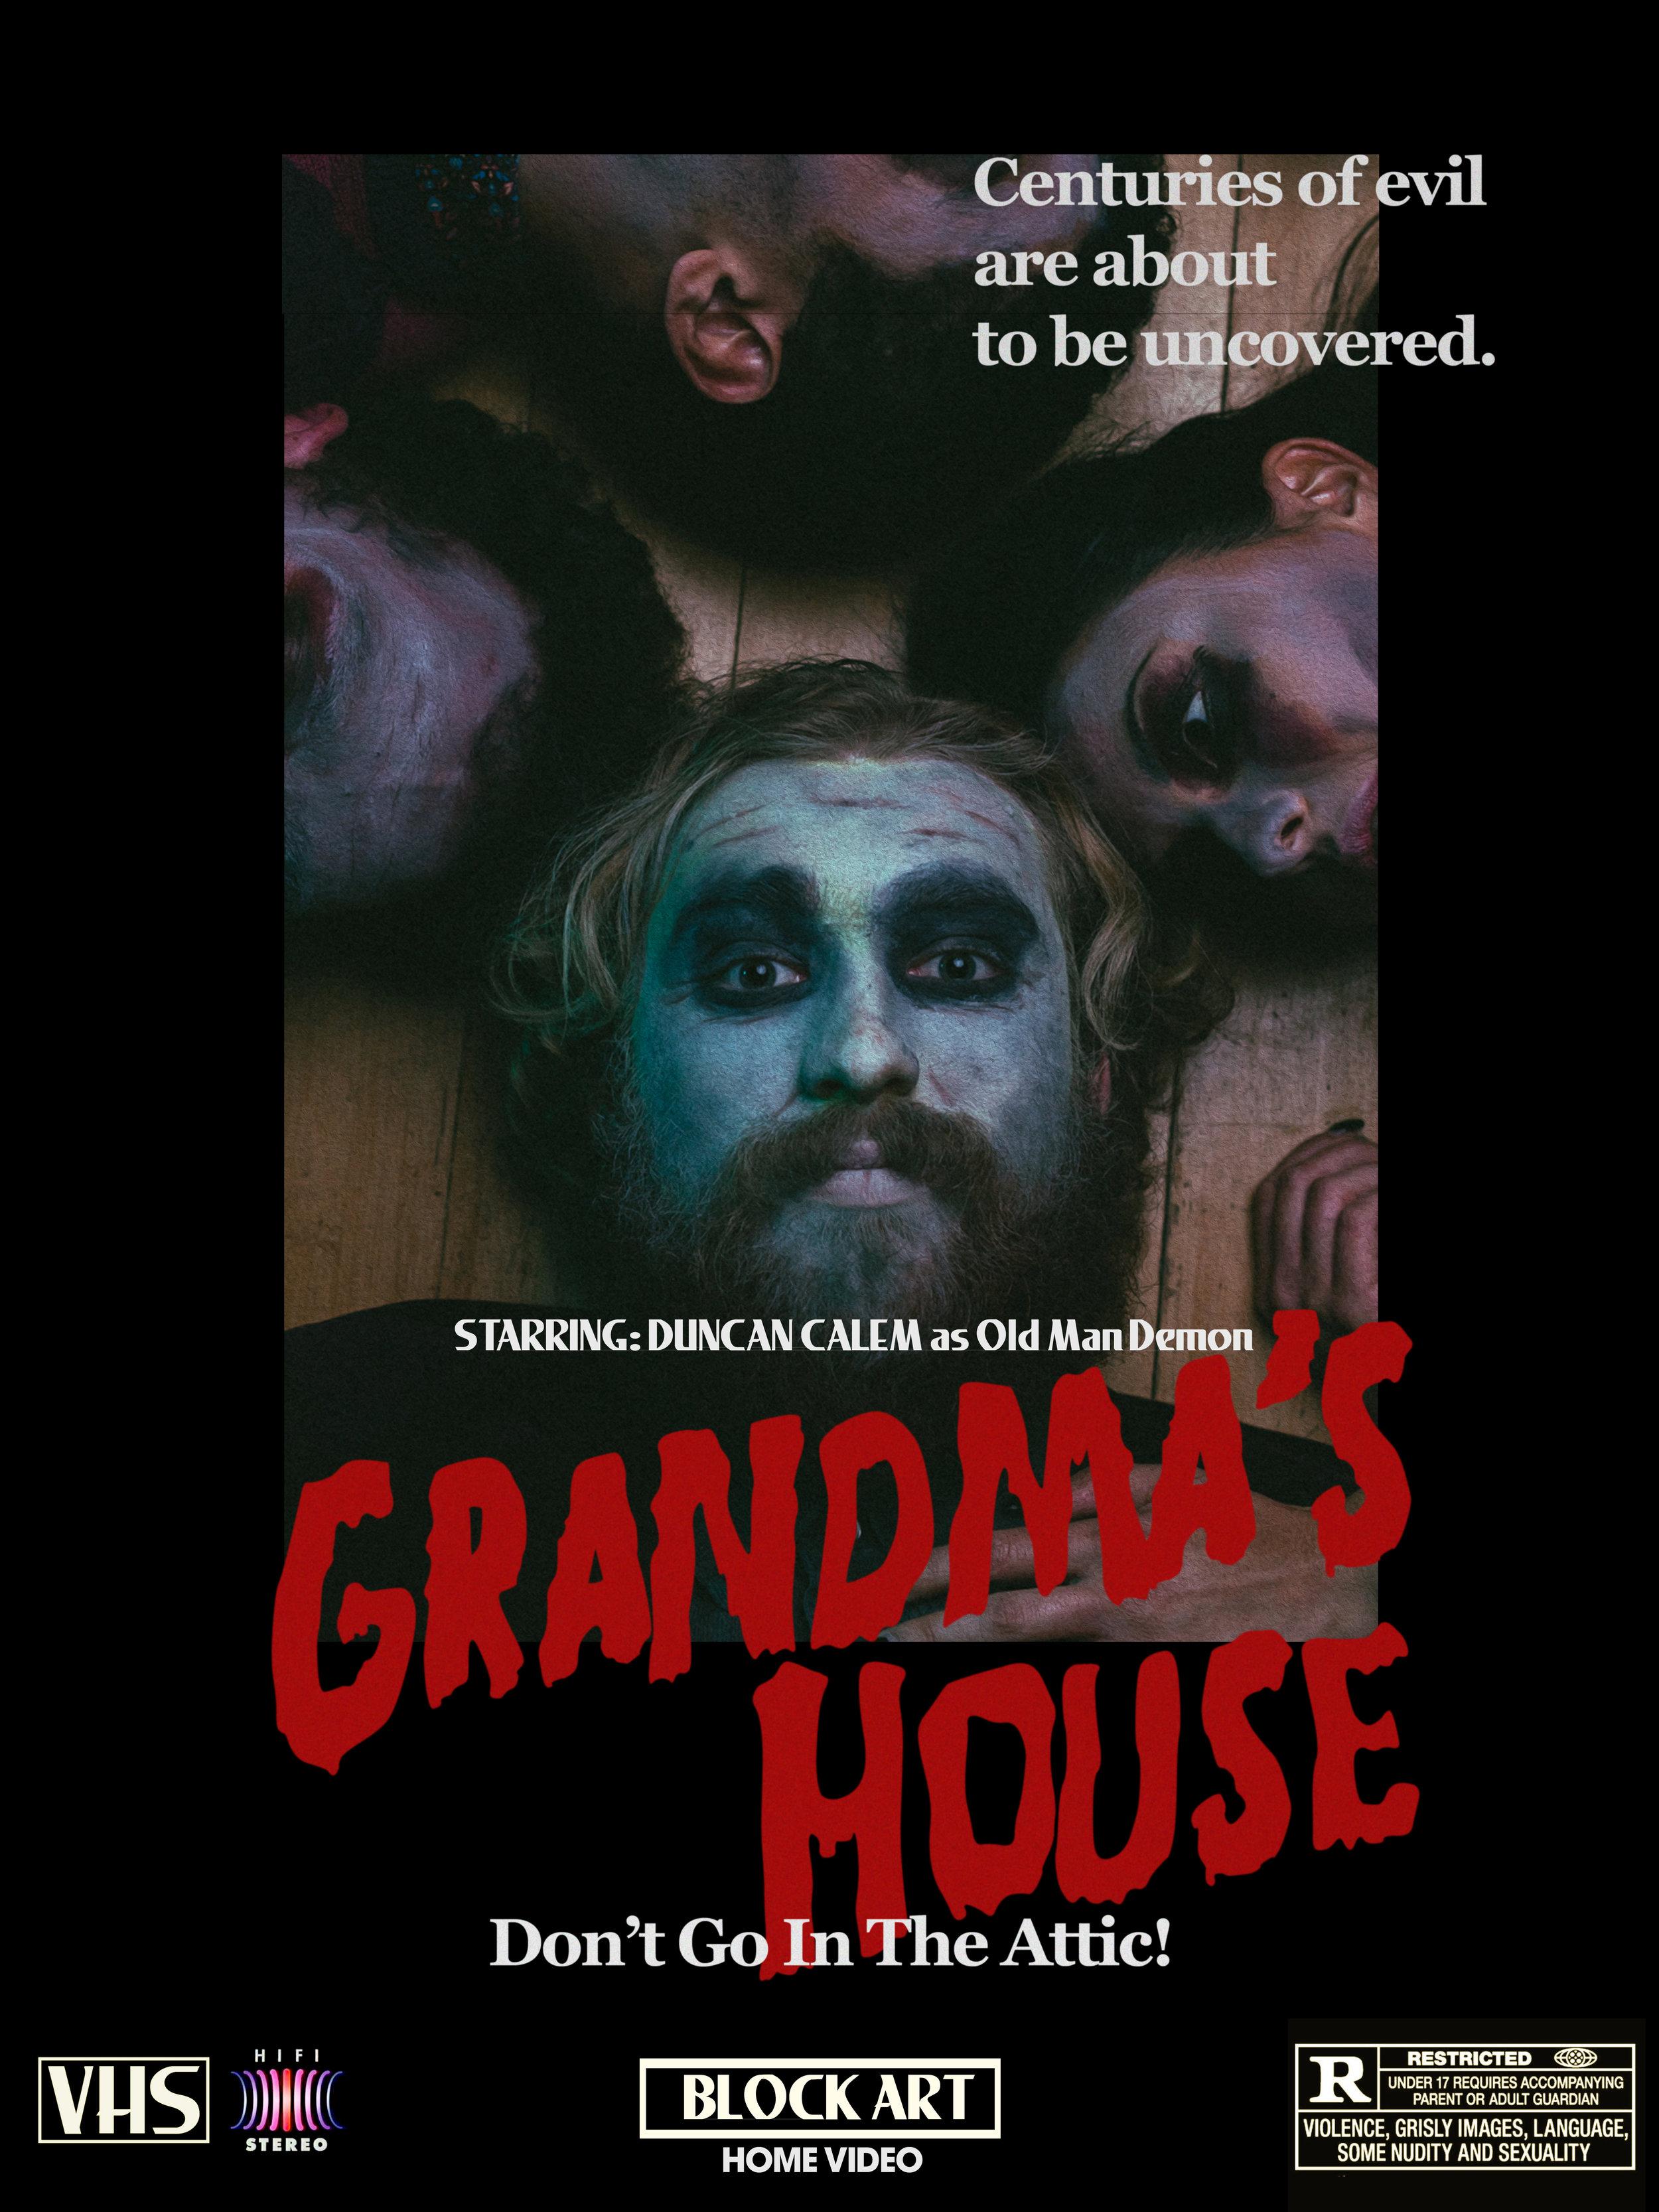 granmas house VHS.jpg